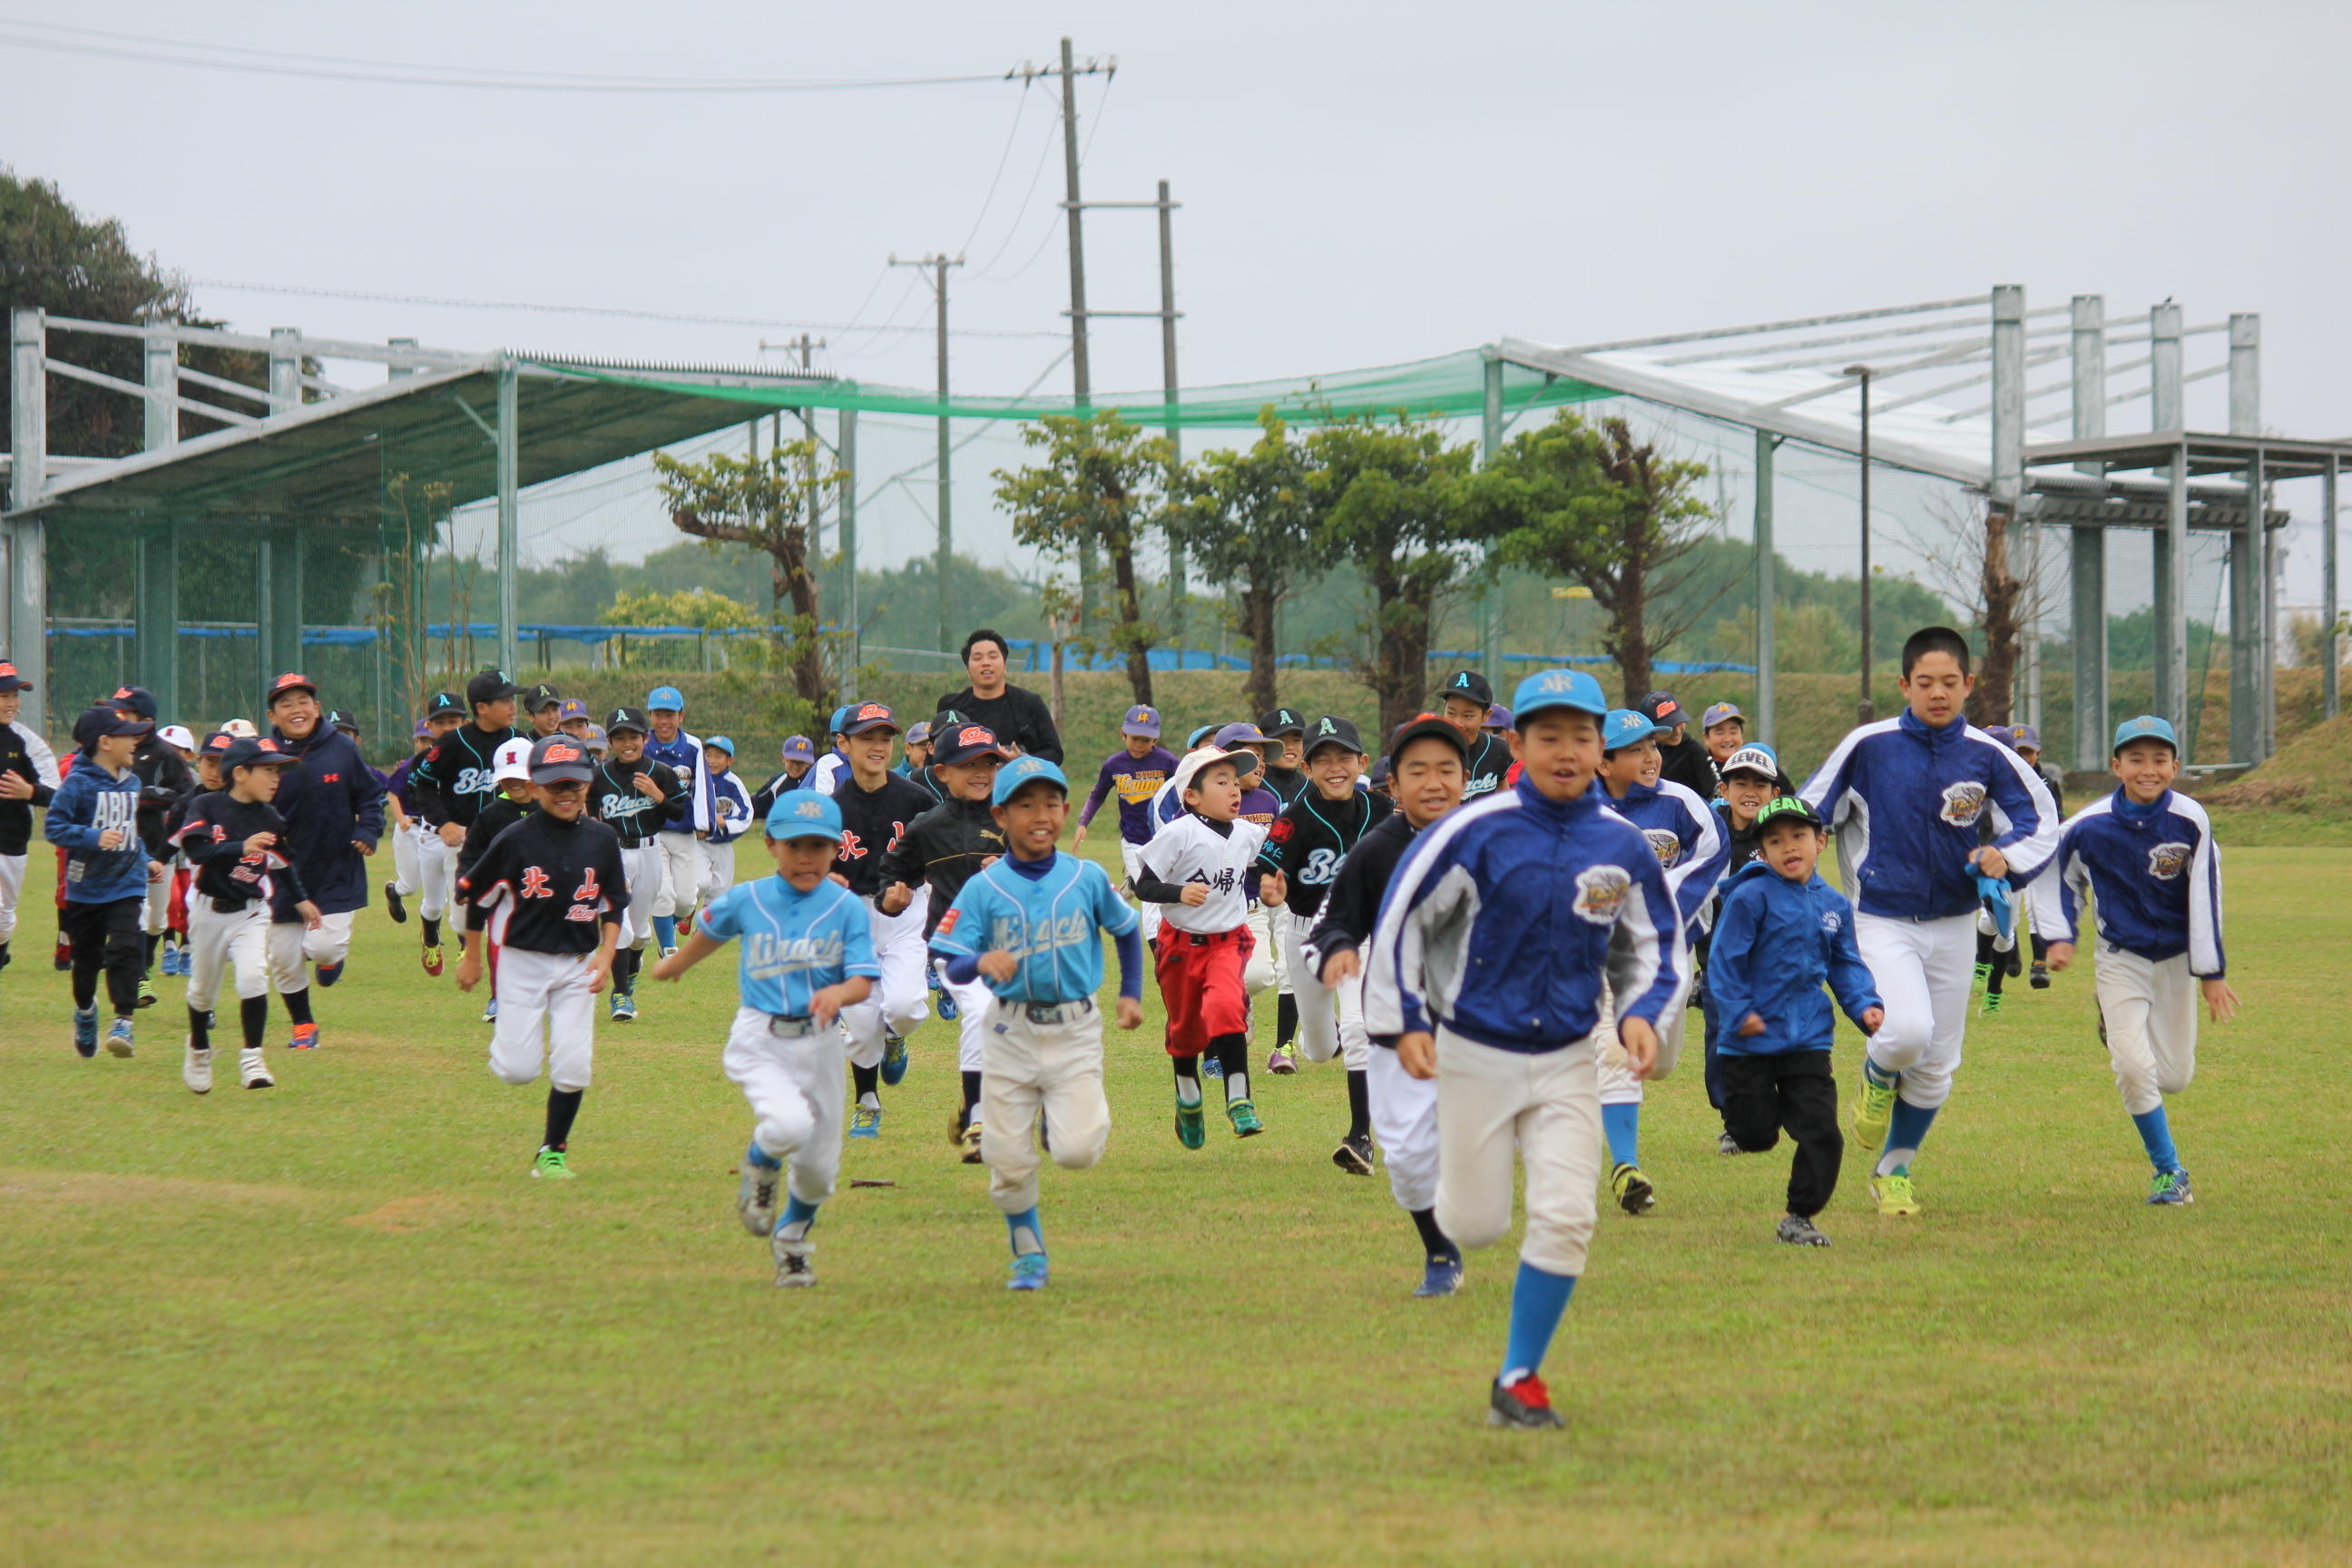 http://news.yoshimoto.co.jp/20170314190907-862691547059a29602998177ab2aaf03757cd0d1.jpg